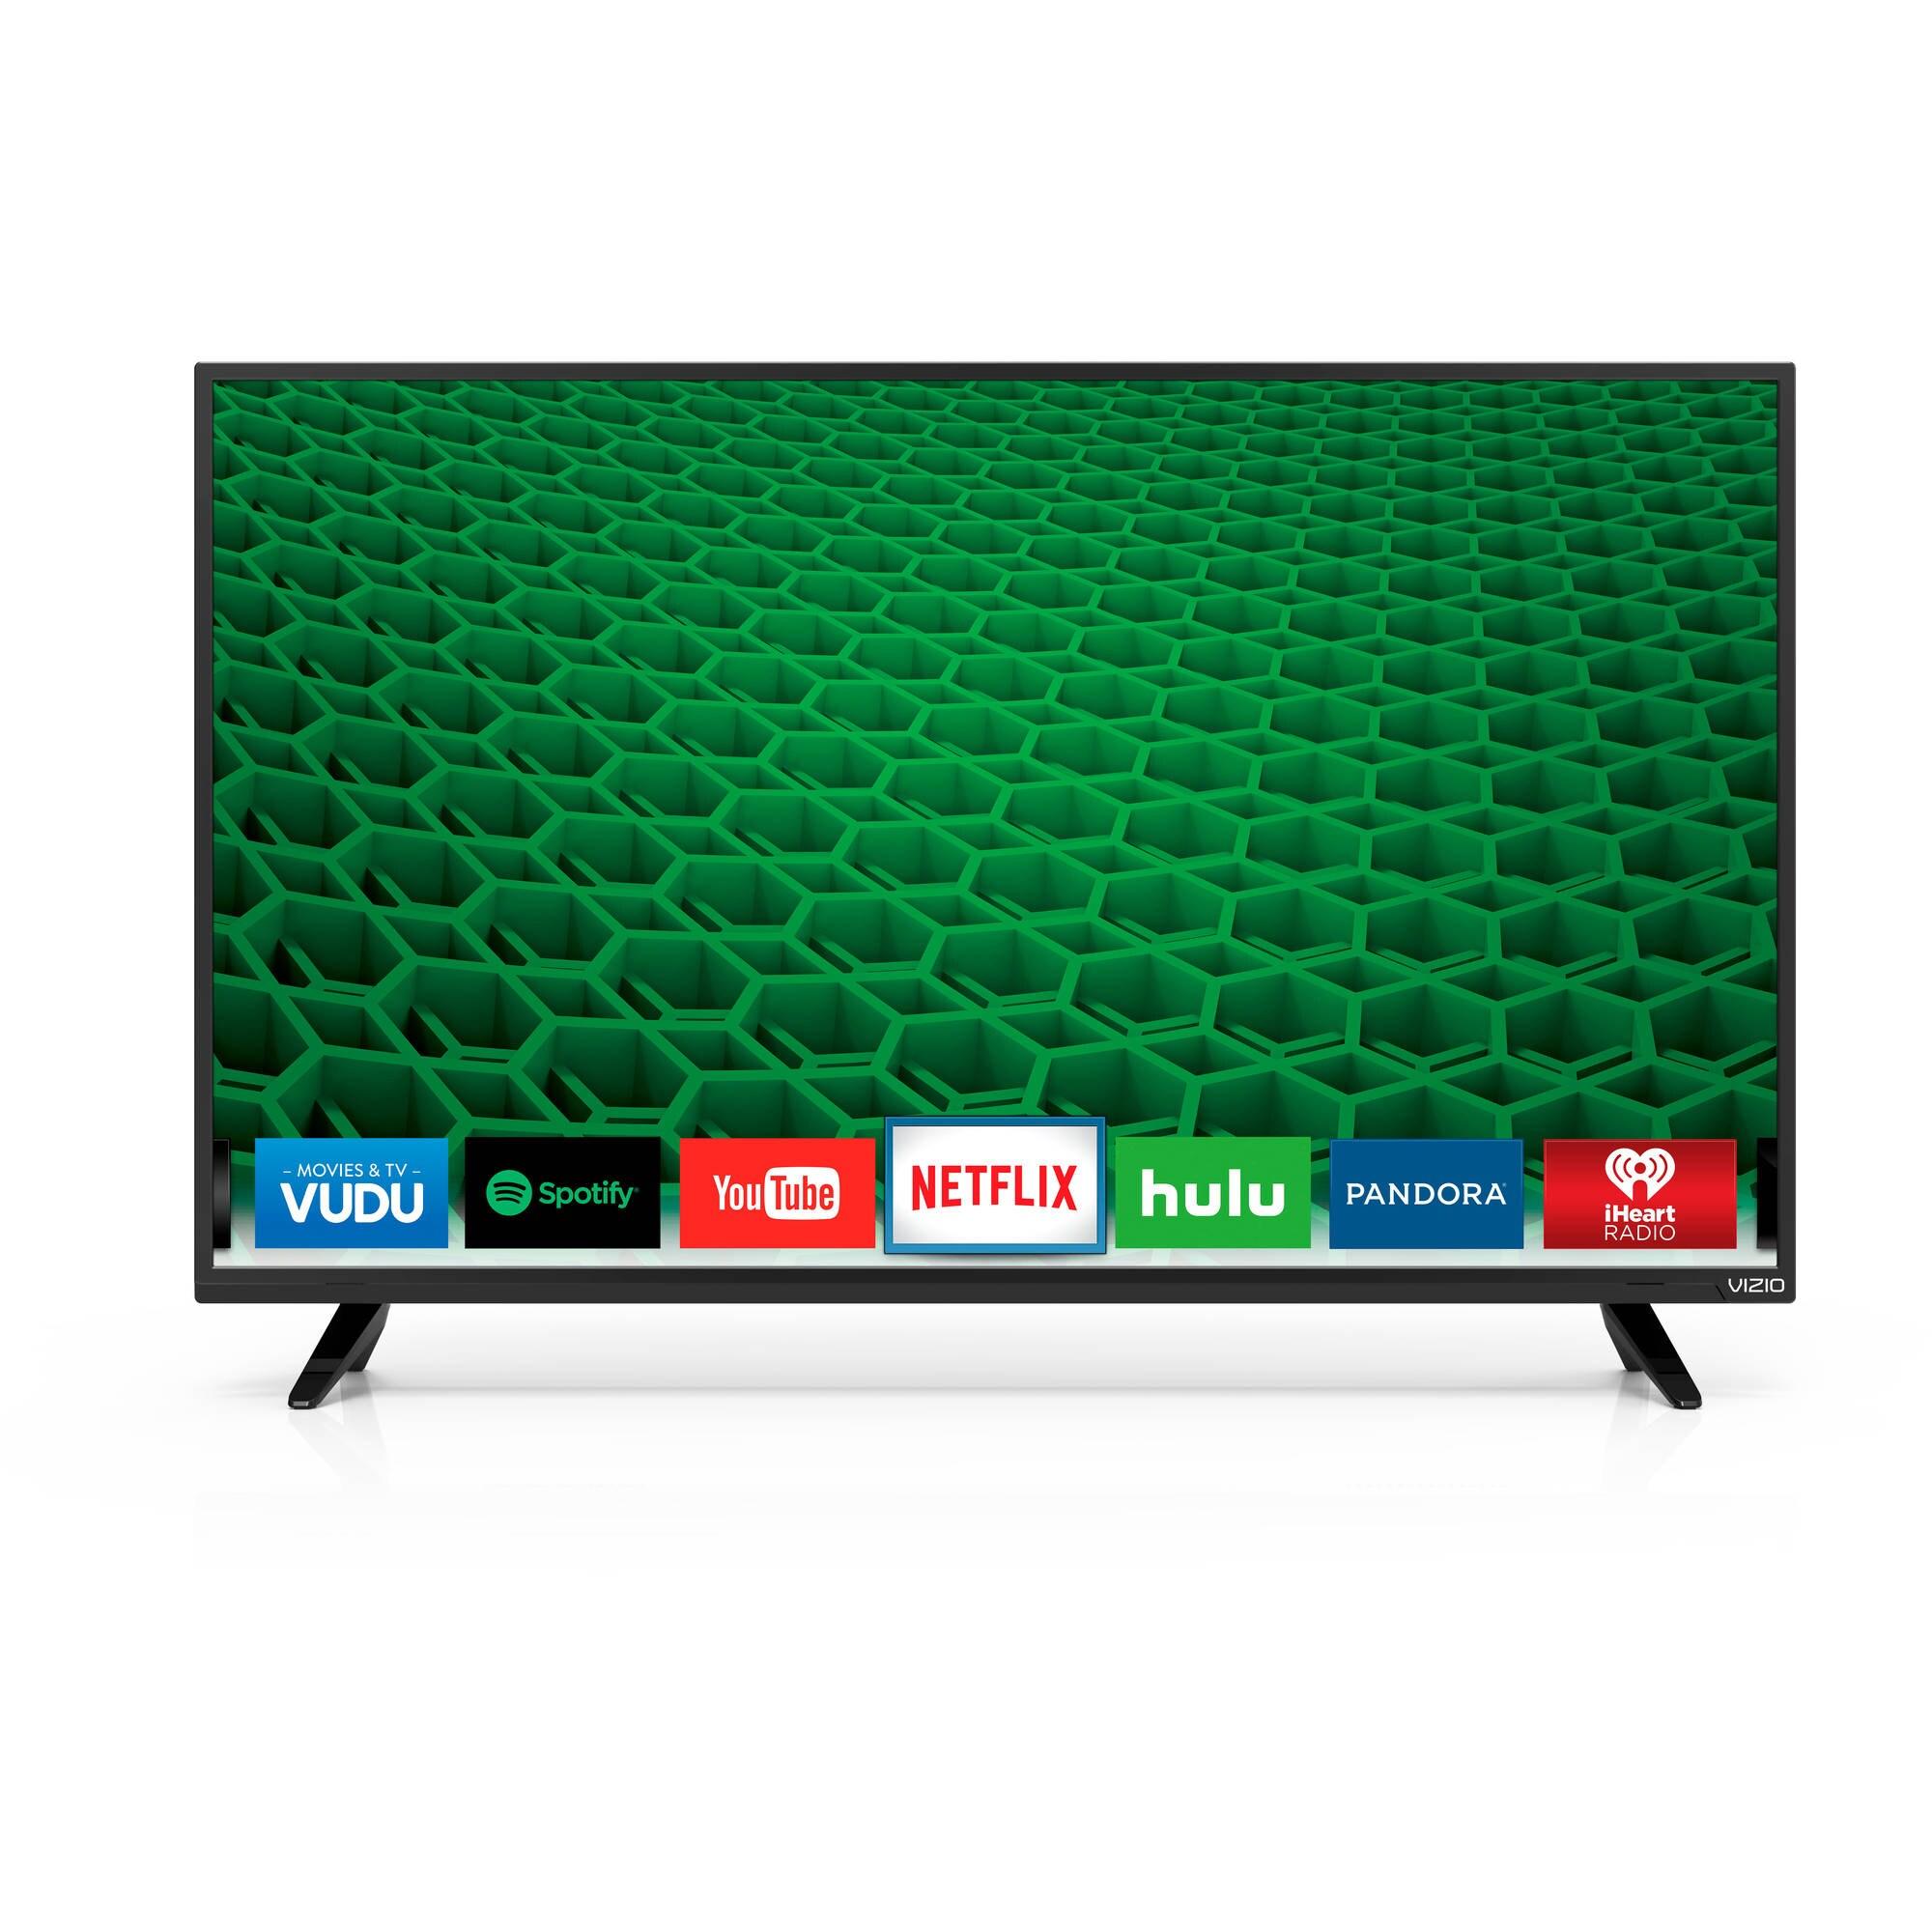 VIZIO D39h-D0 D-Series 39-inches Full Array LED Widescreen Smart TV